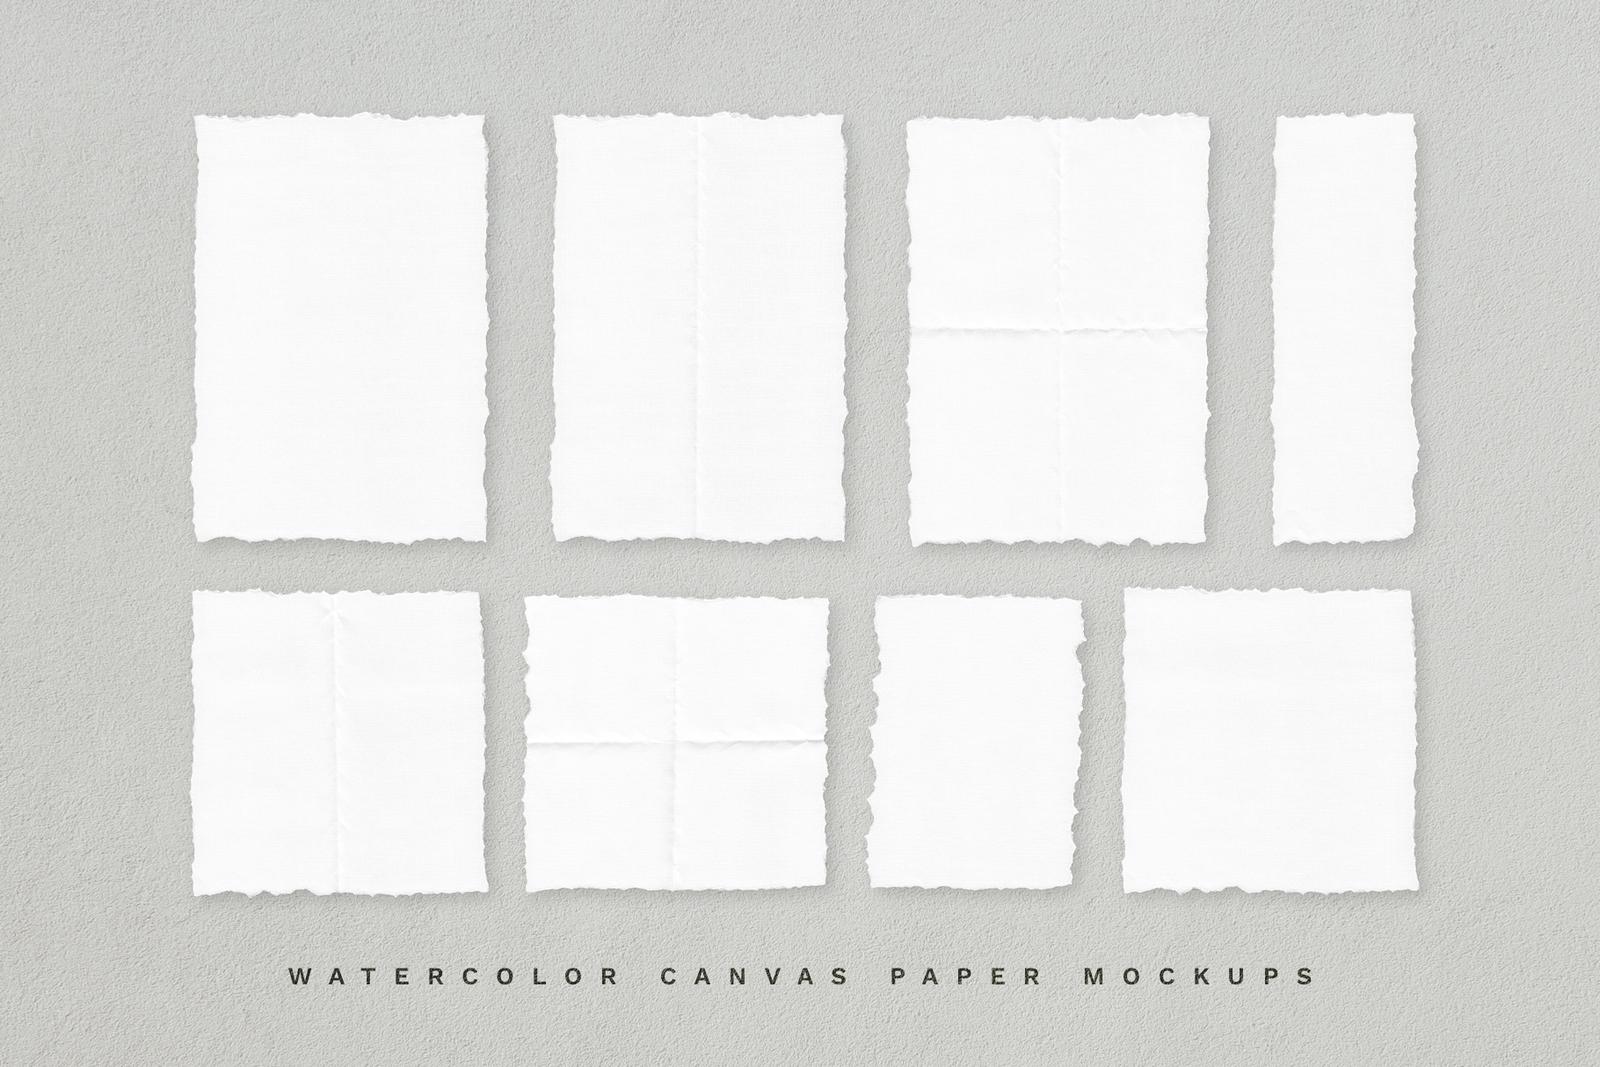 Deckle Edge Paper Mockup Set